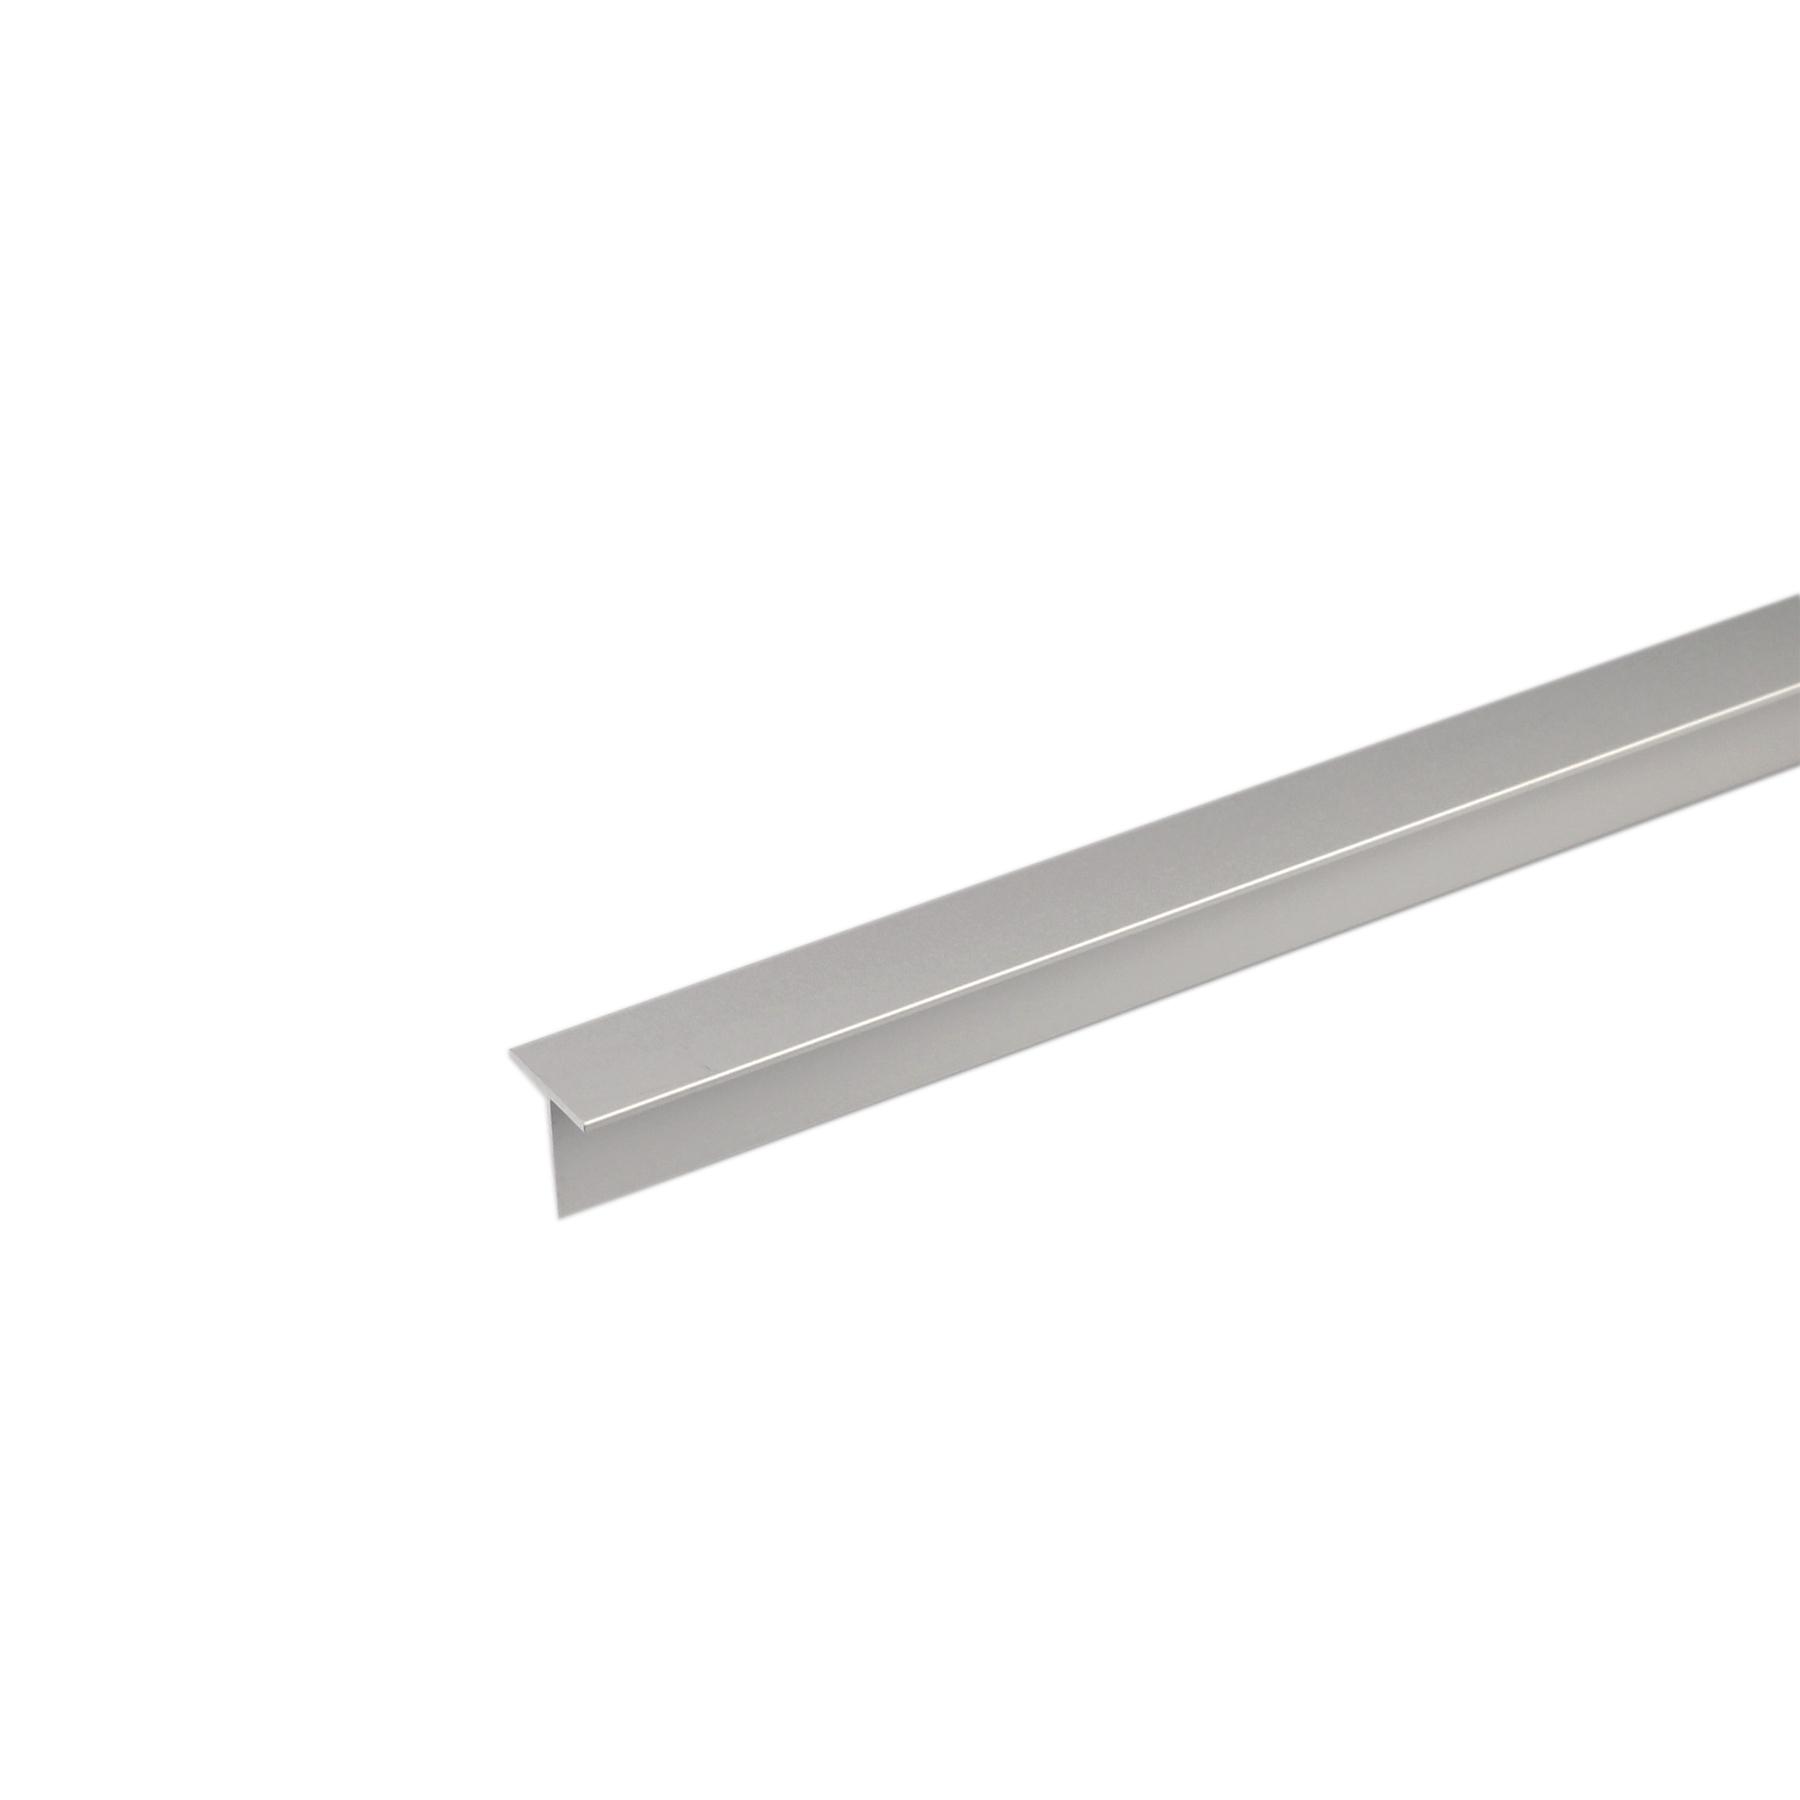 Perfil T Alumínio Anodizado 1mx30cm